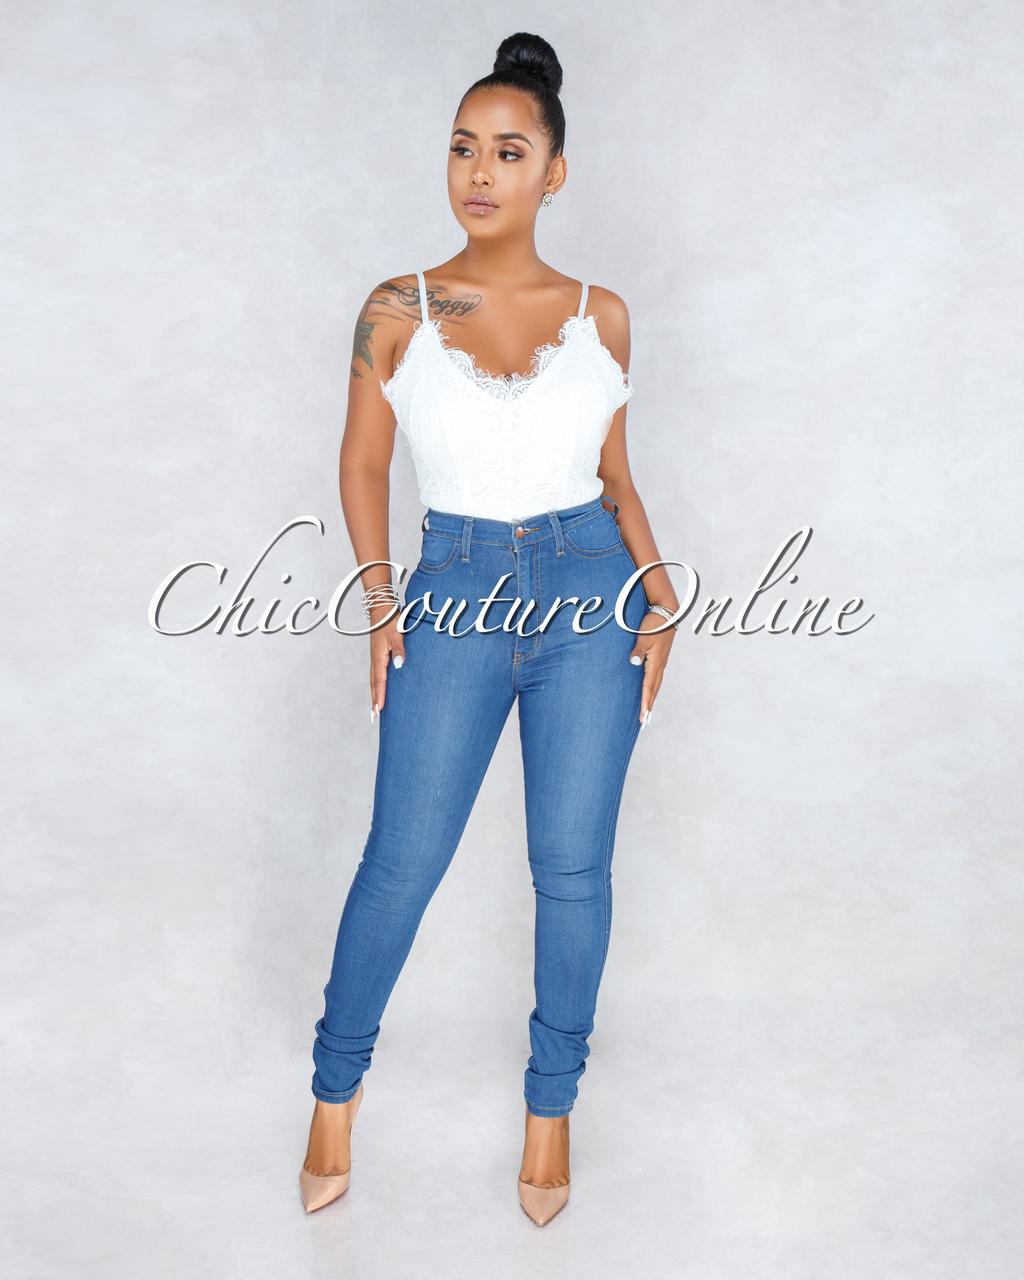 Thandie Off-White Lace Scallop Bodysuit